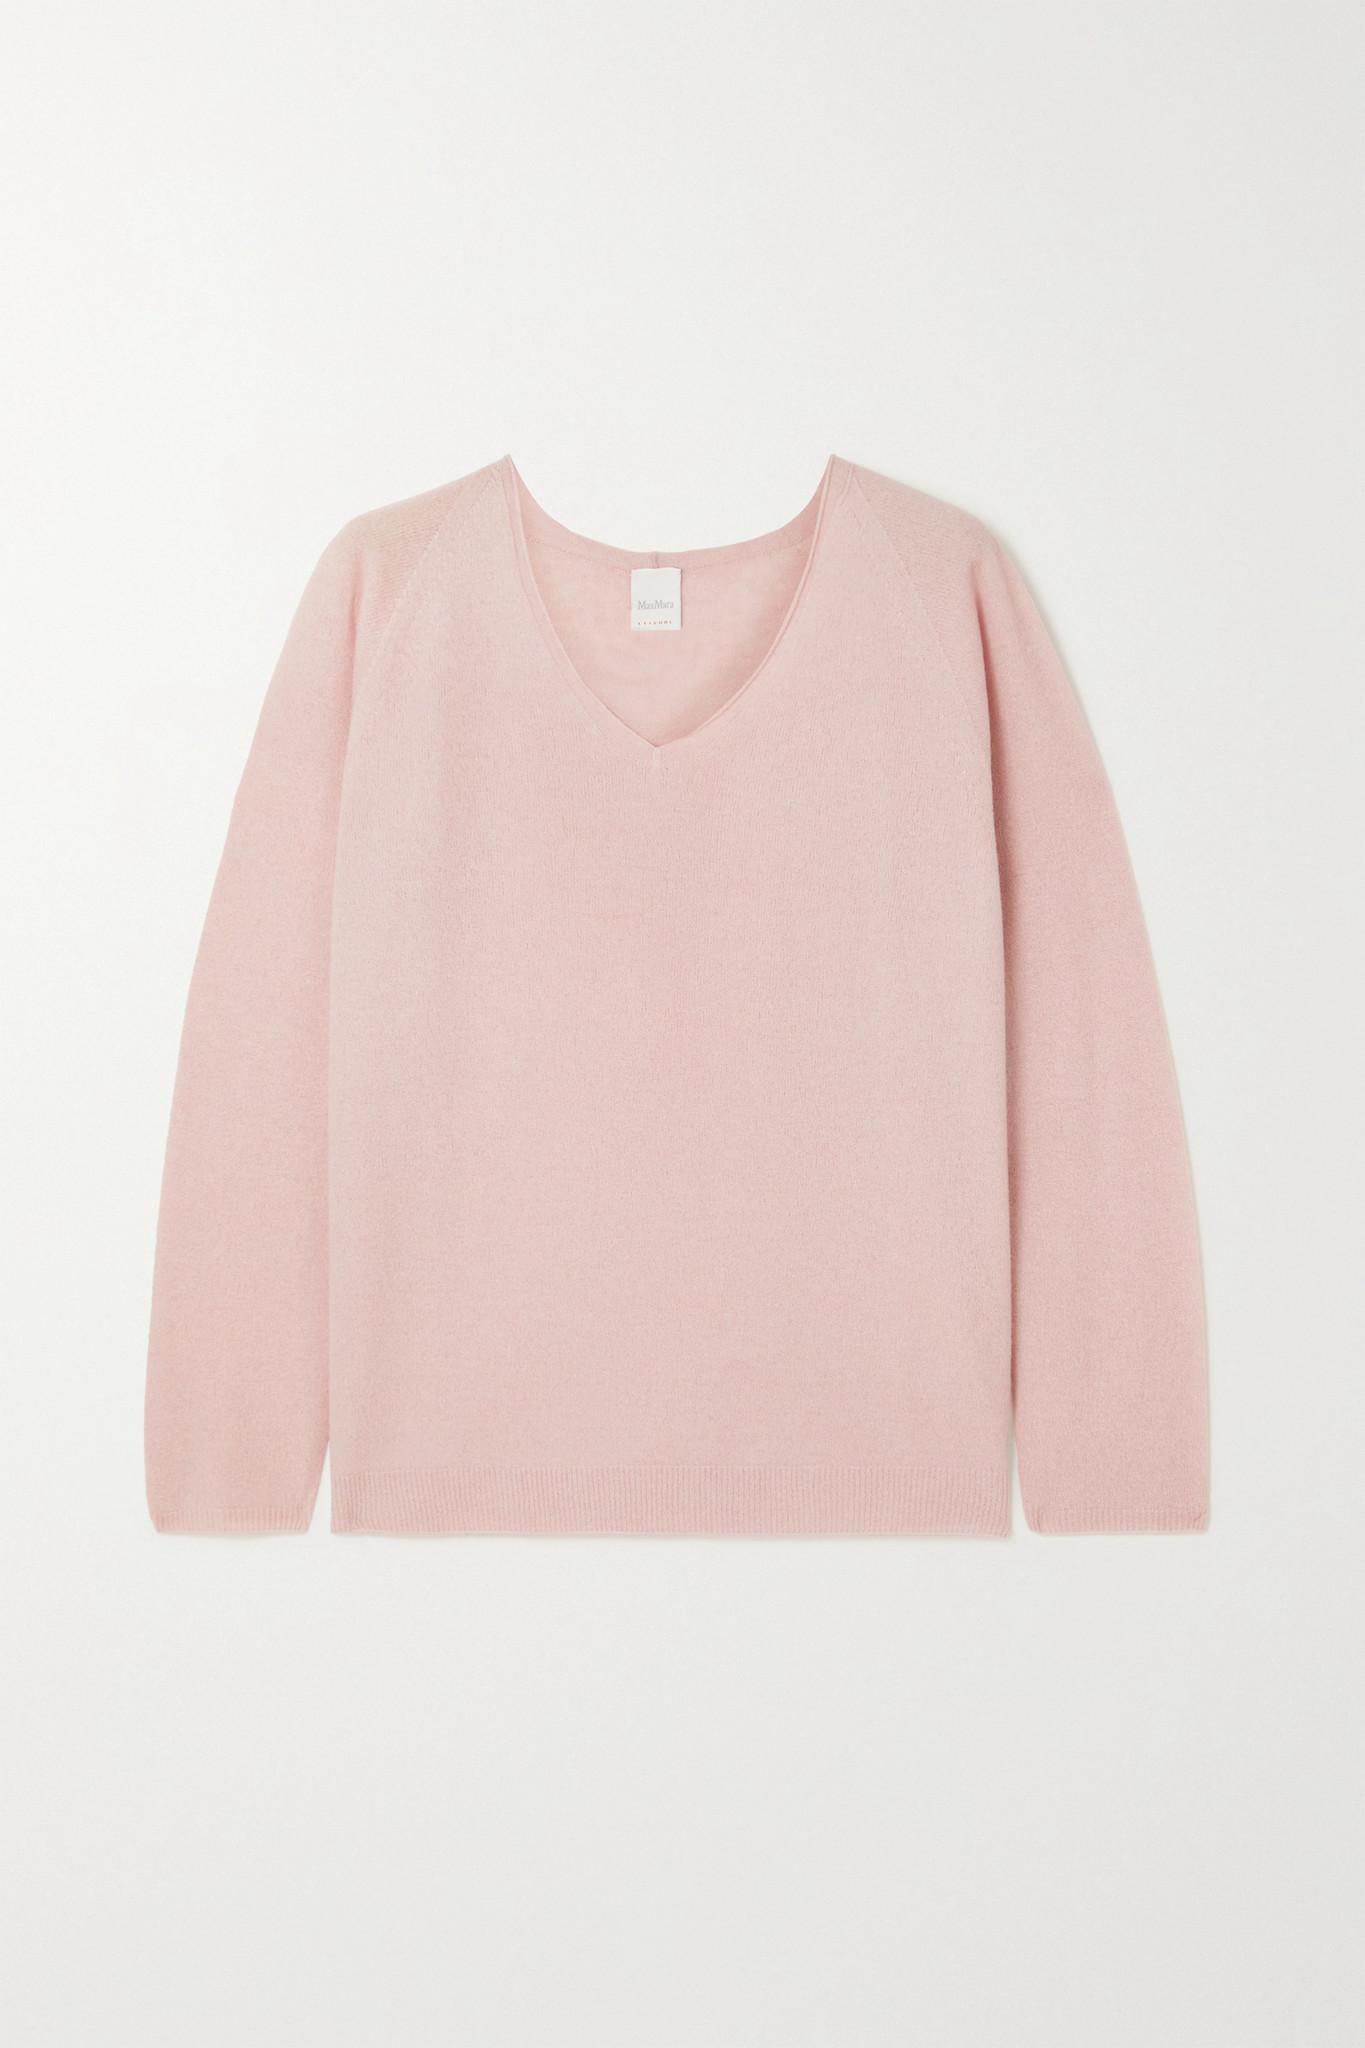 MAX MARA - + Leisure Smirne Knitted Sweater - Pink - medium